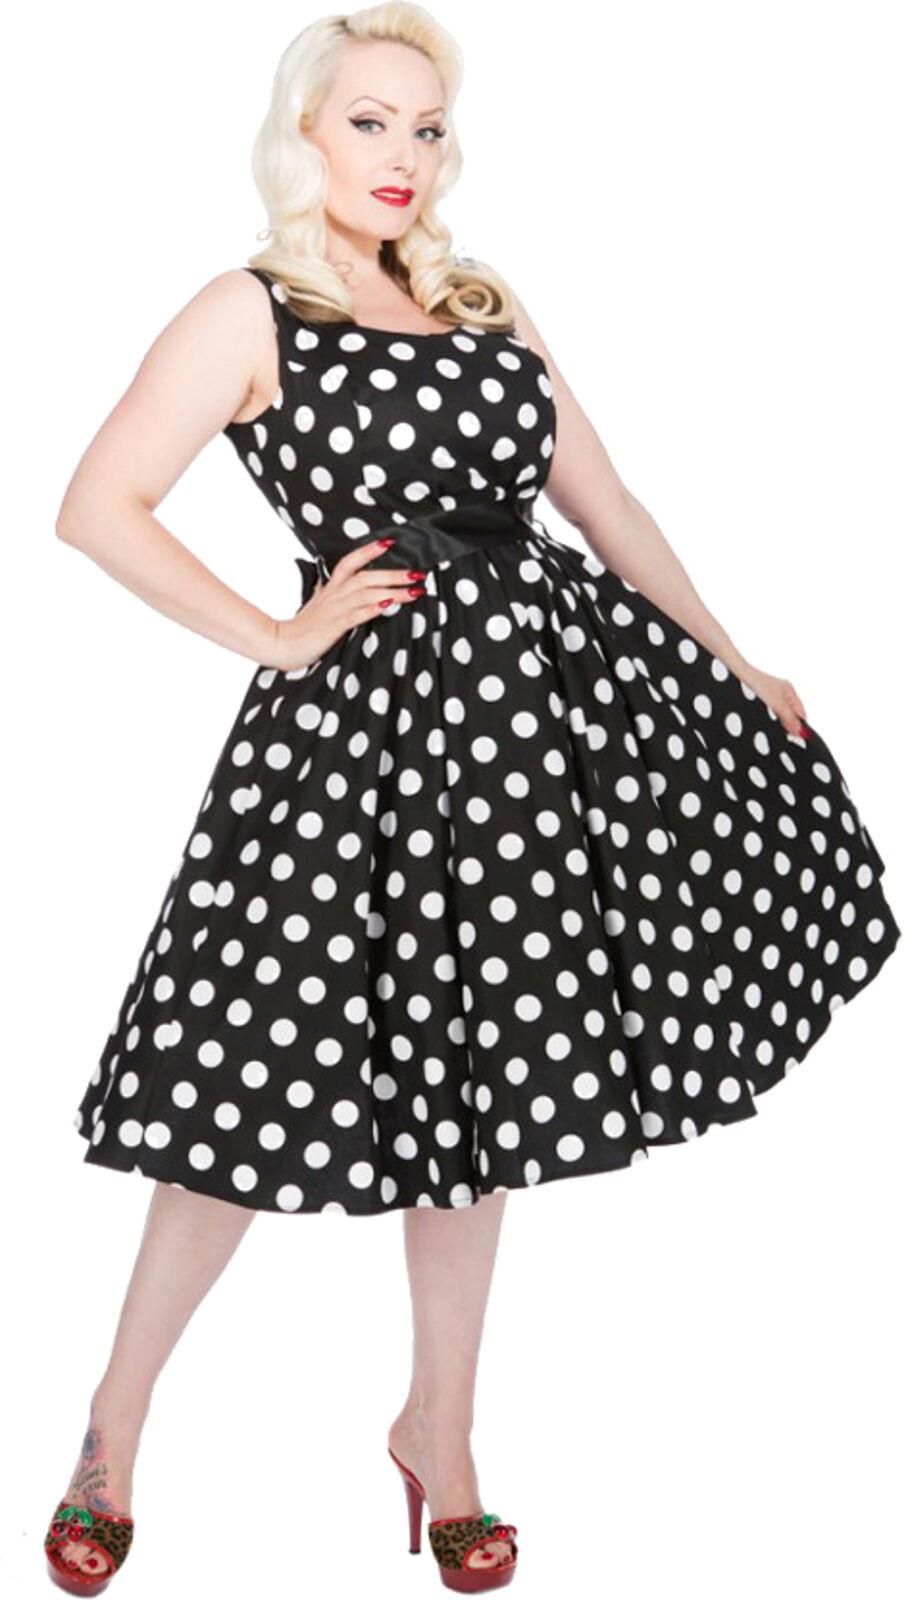 H & R Polka Dots 50s punti VINTAGE DRESS DRESS DRESS Abito Spalline-BLK Rockabilly 44ce16